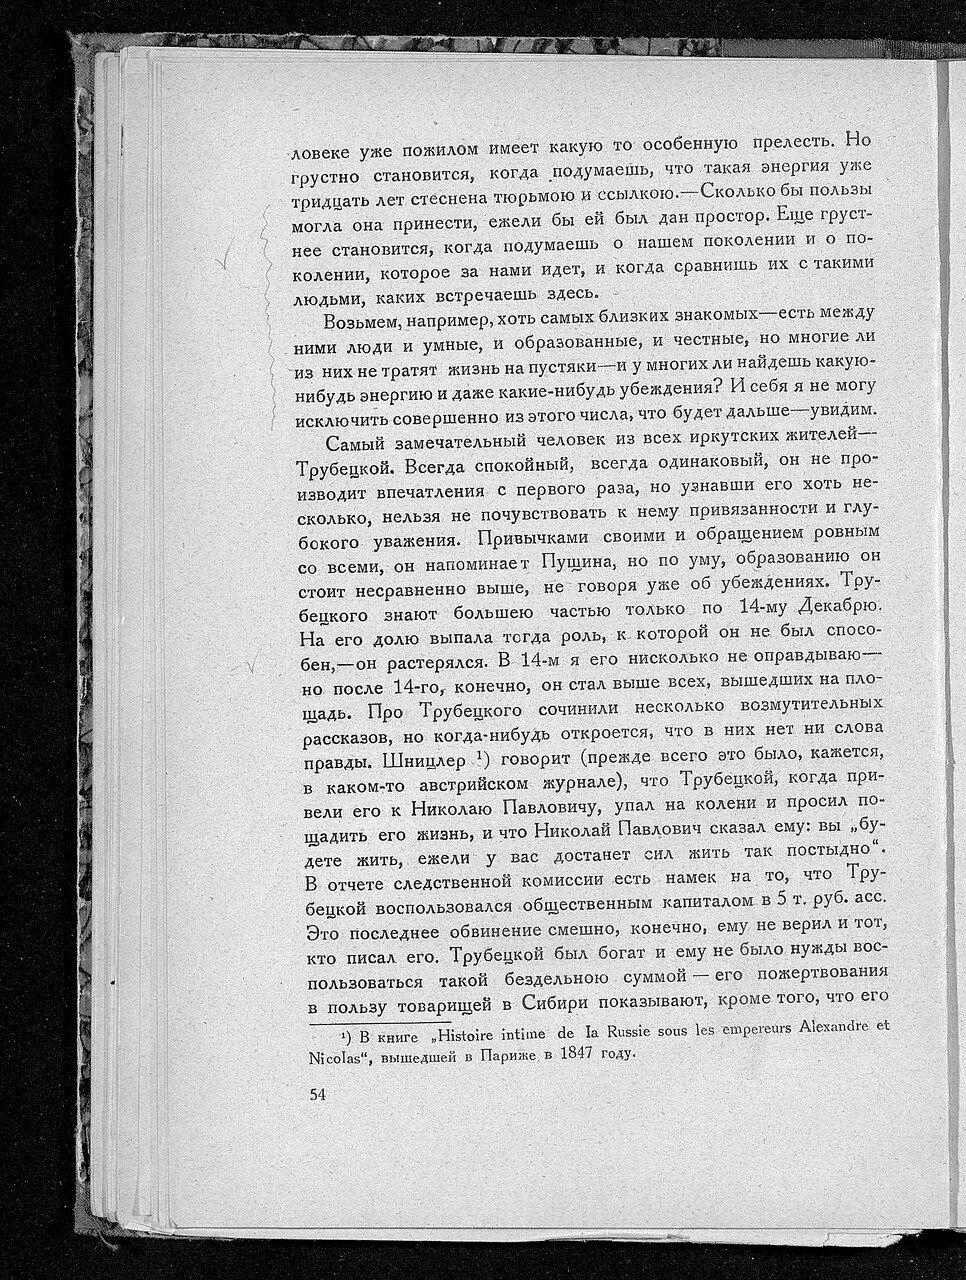 https://img-fotki.yandex.ru/get/892397/199368979.a1/0_214332_e3f3b306_XXXL.jpg